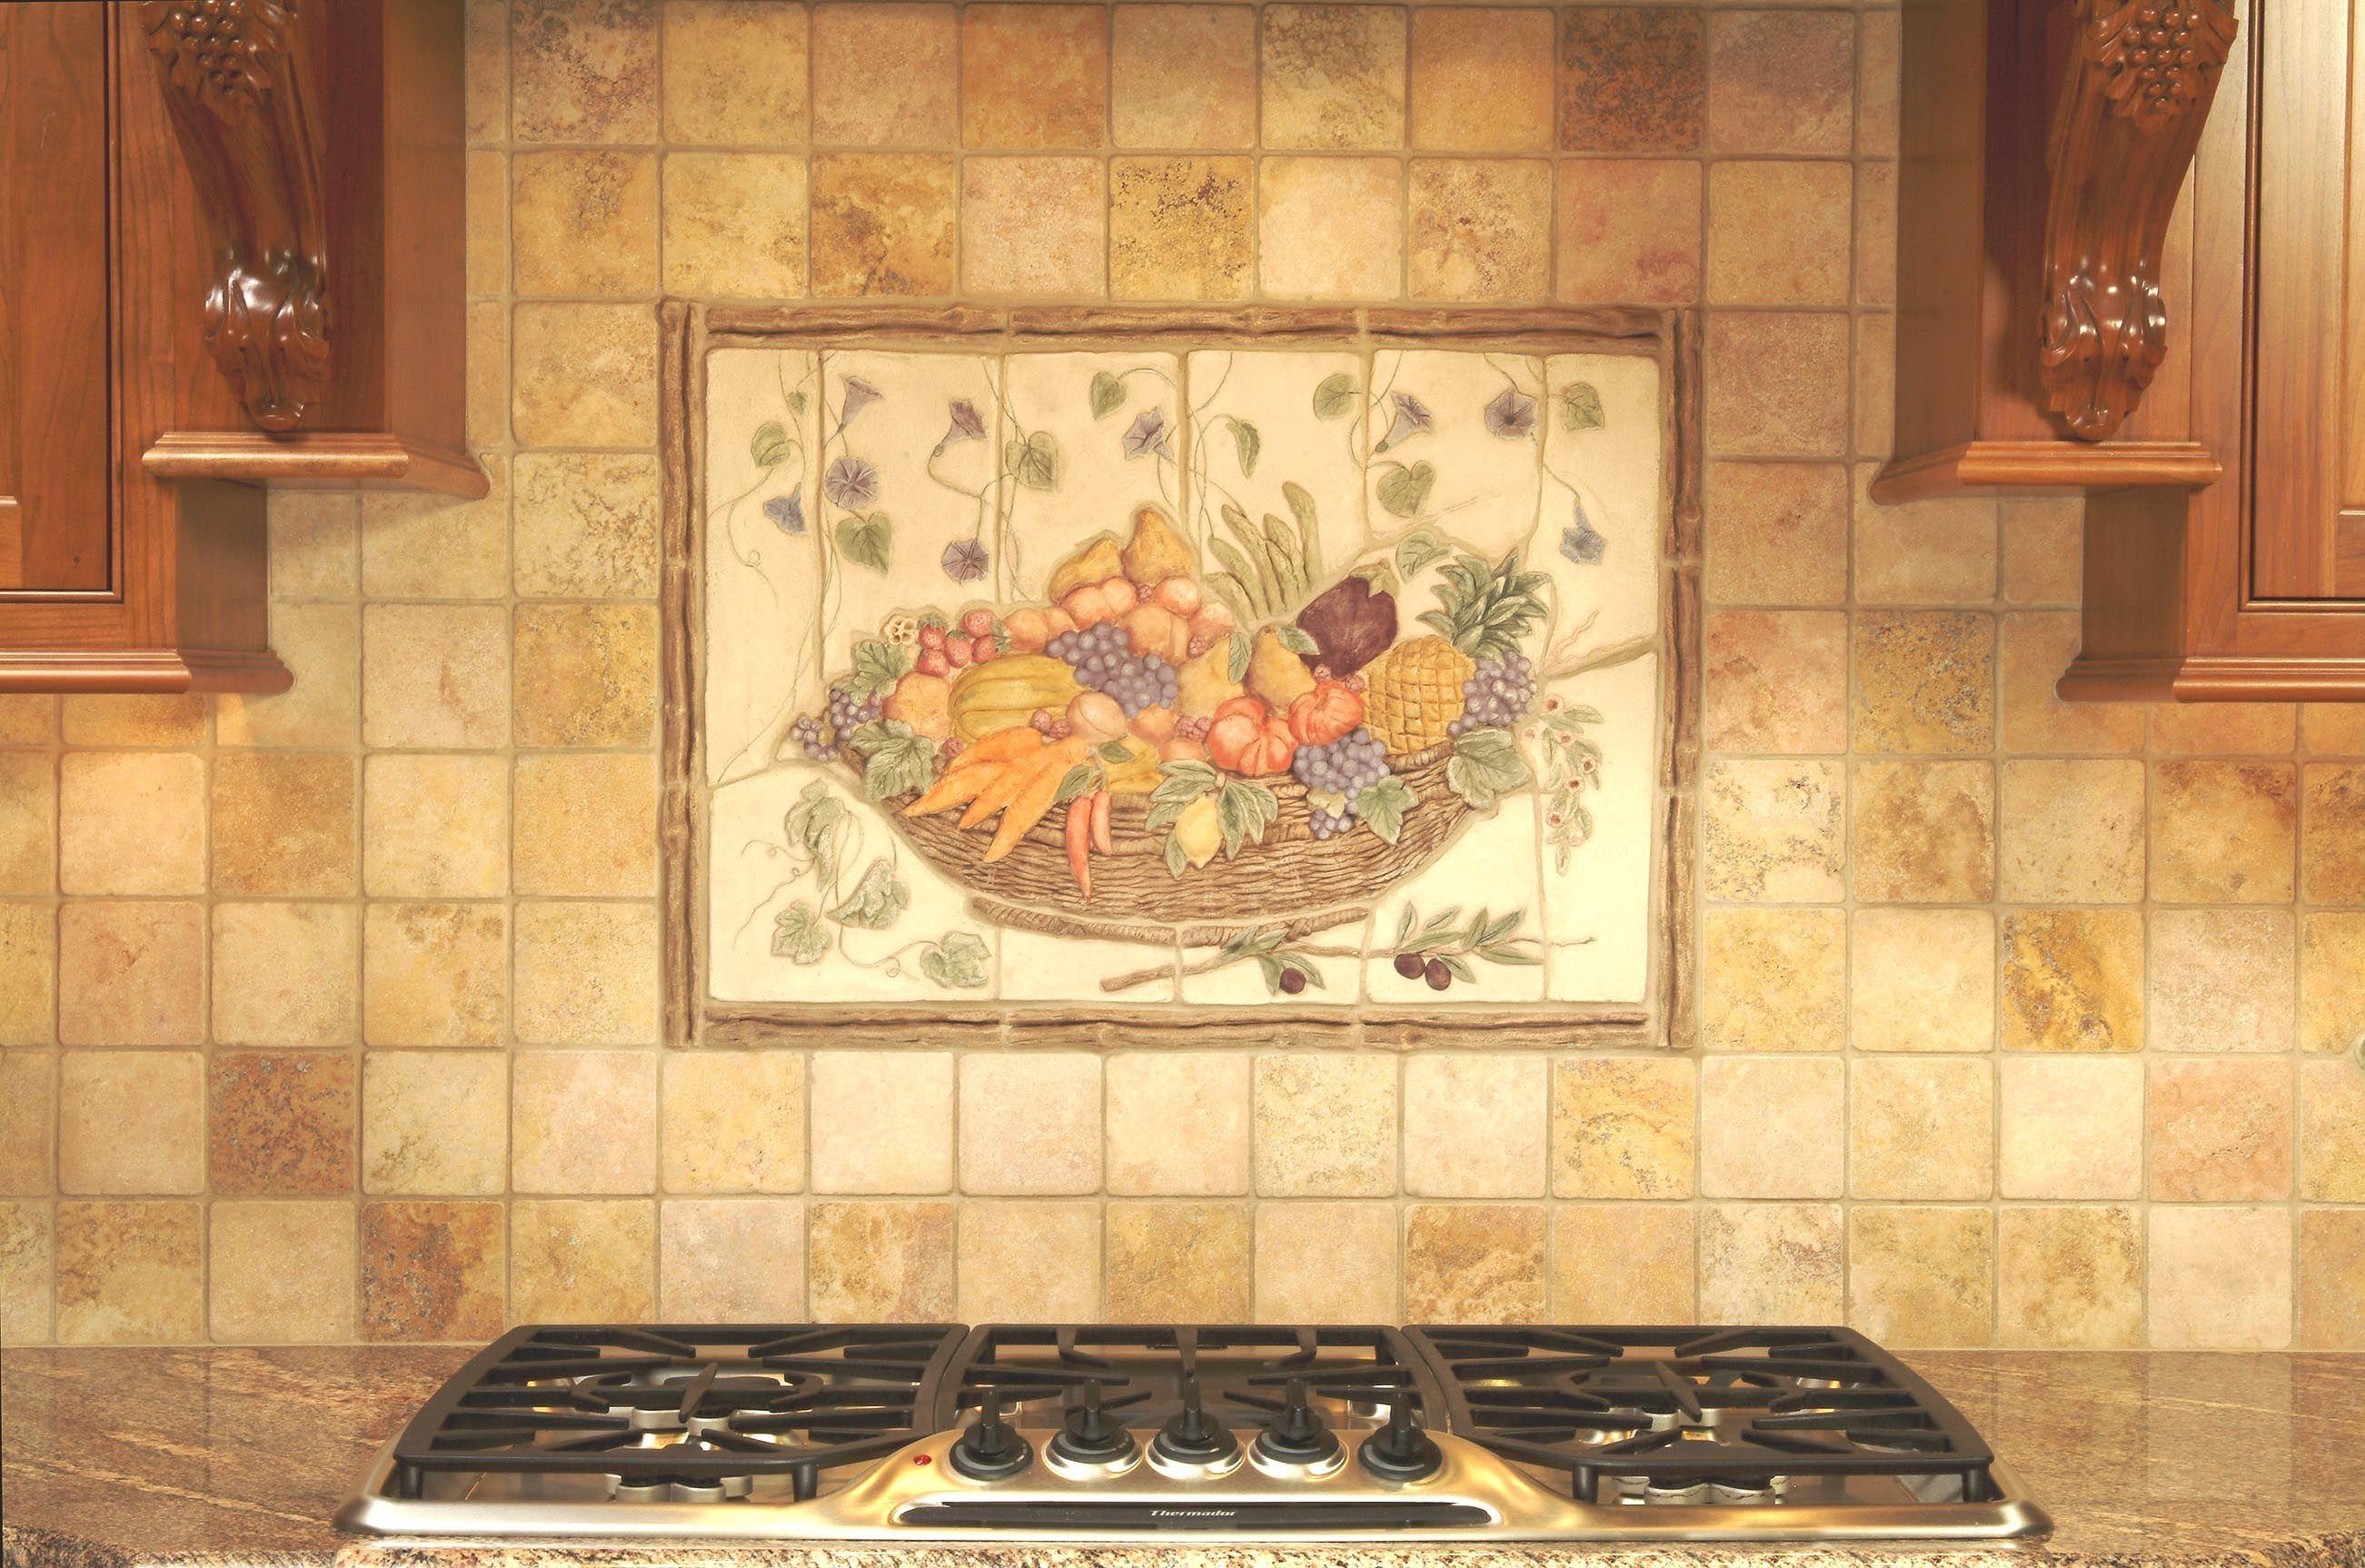 Decorative Ceramic Tile Accents Unique Bathrooms Design Stone Tile